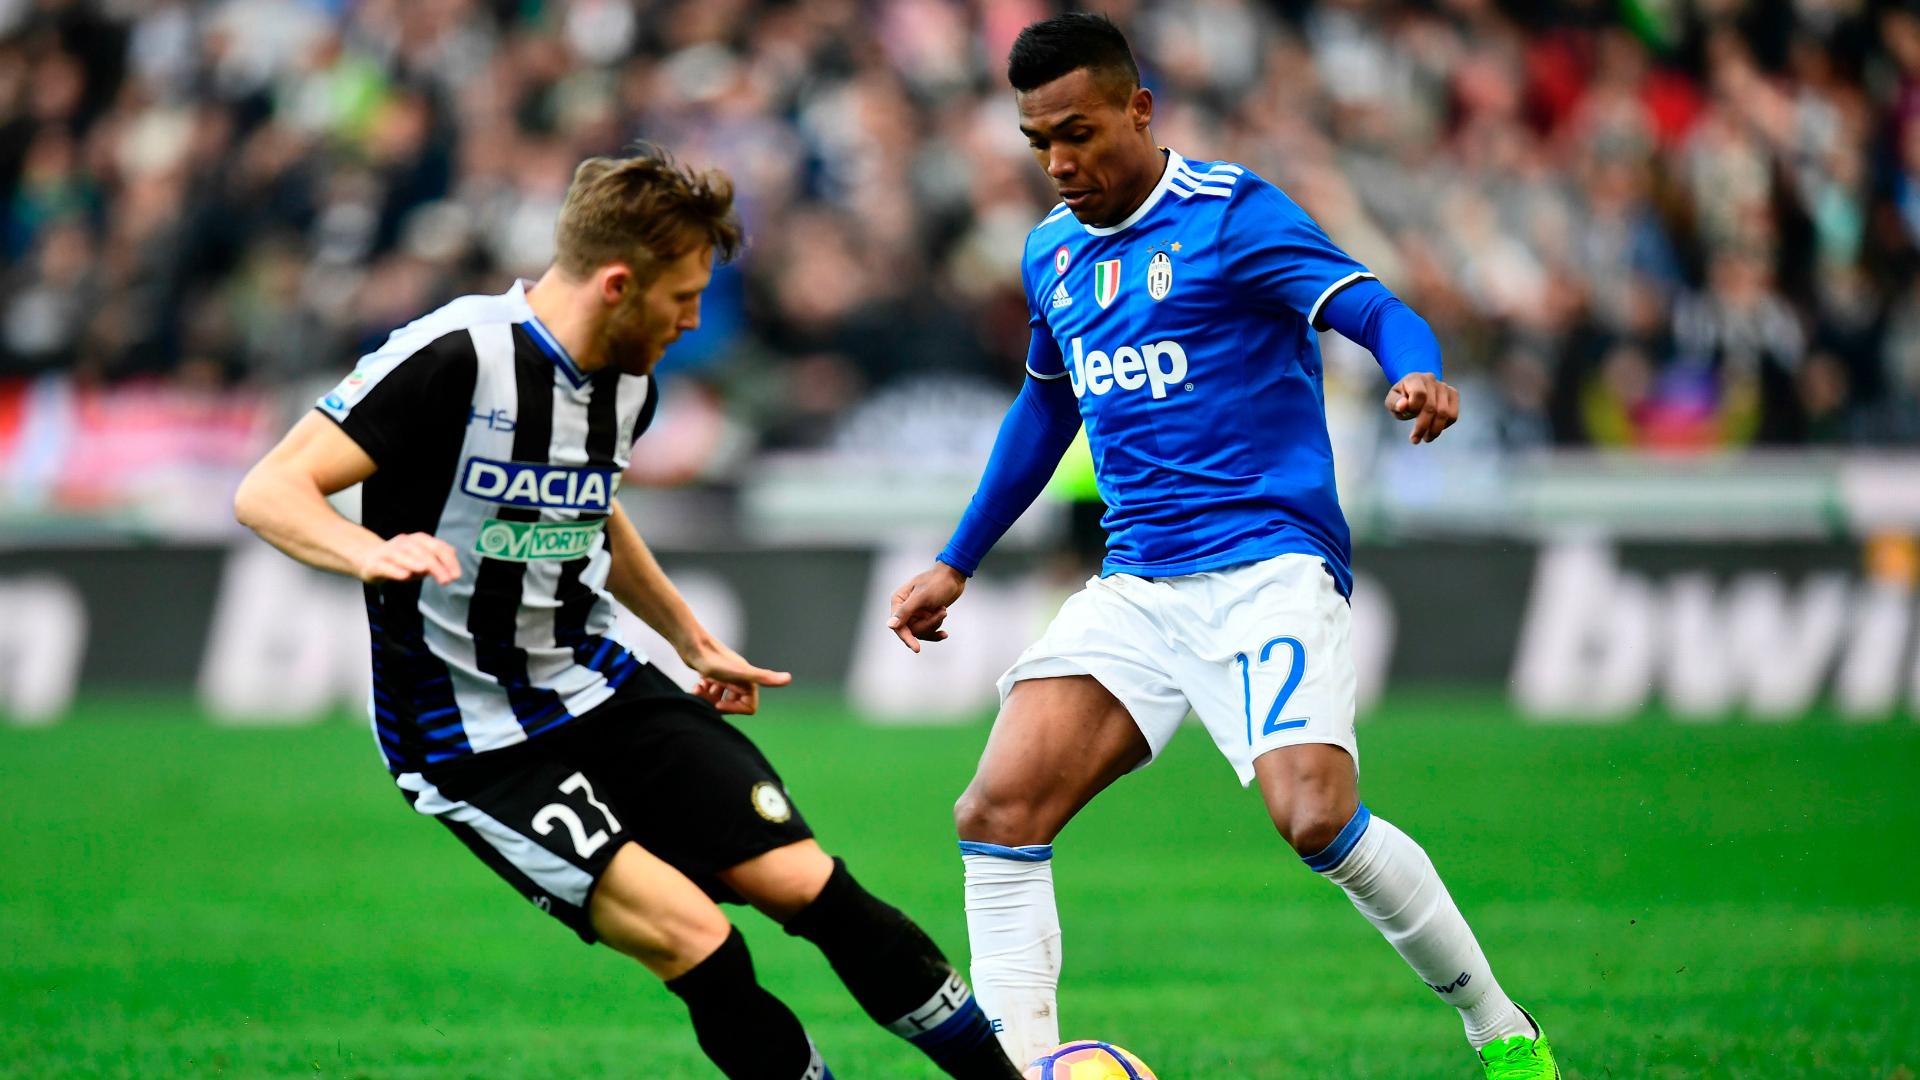 Alex Sandro Udinese Juventus Serie A 05032017